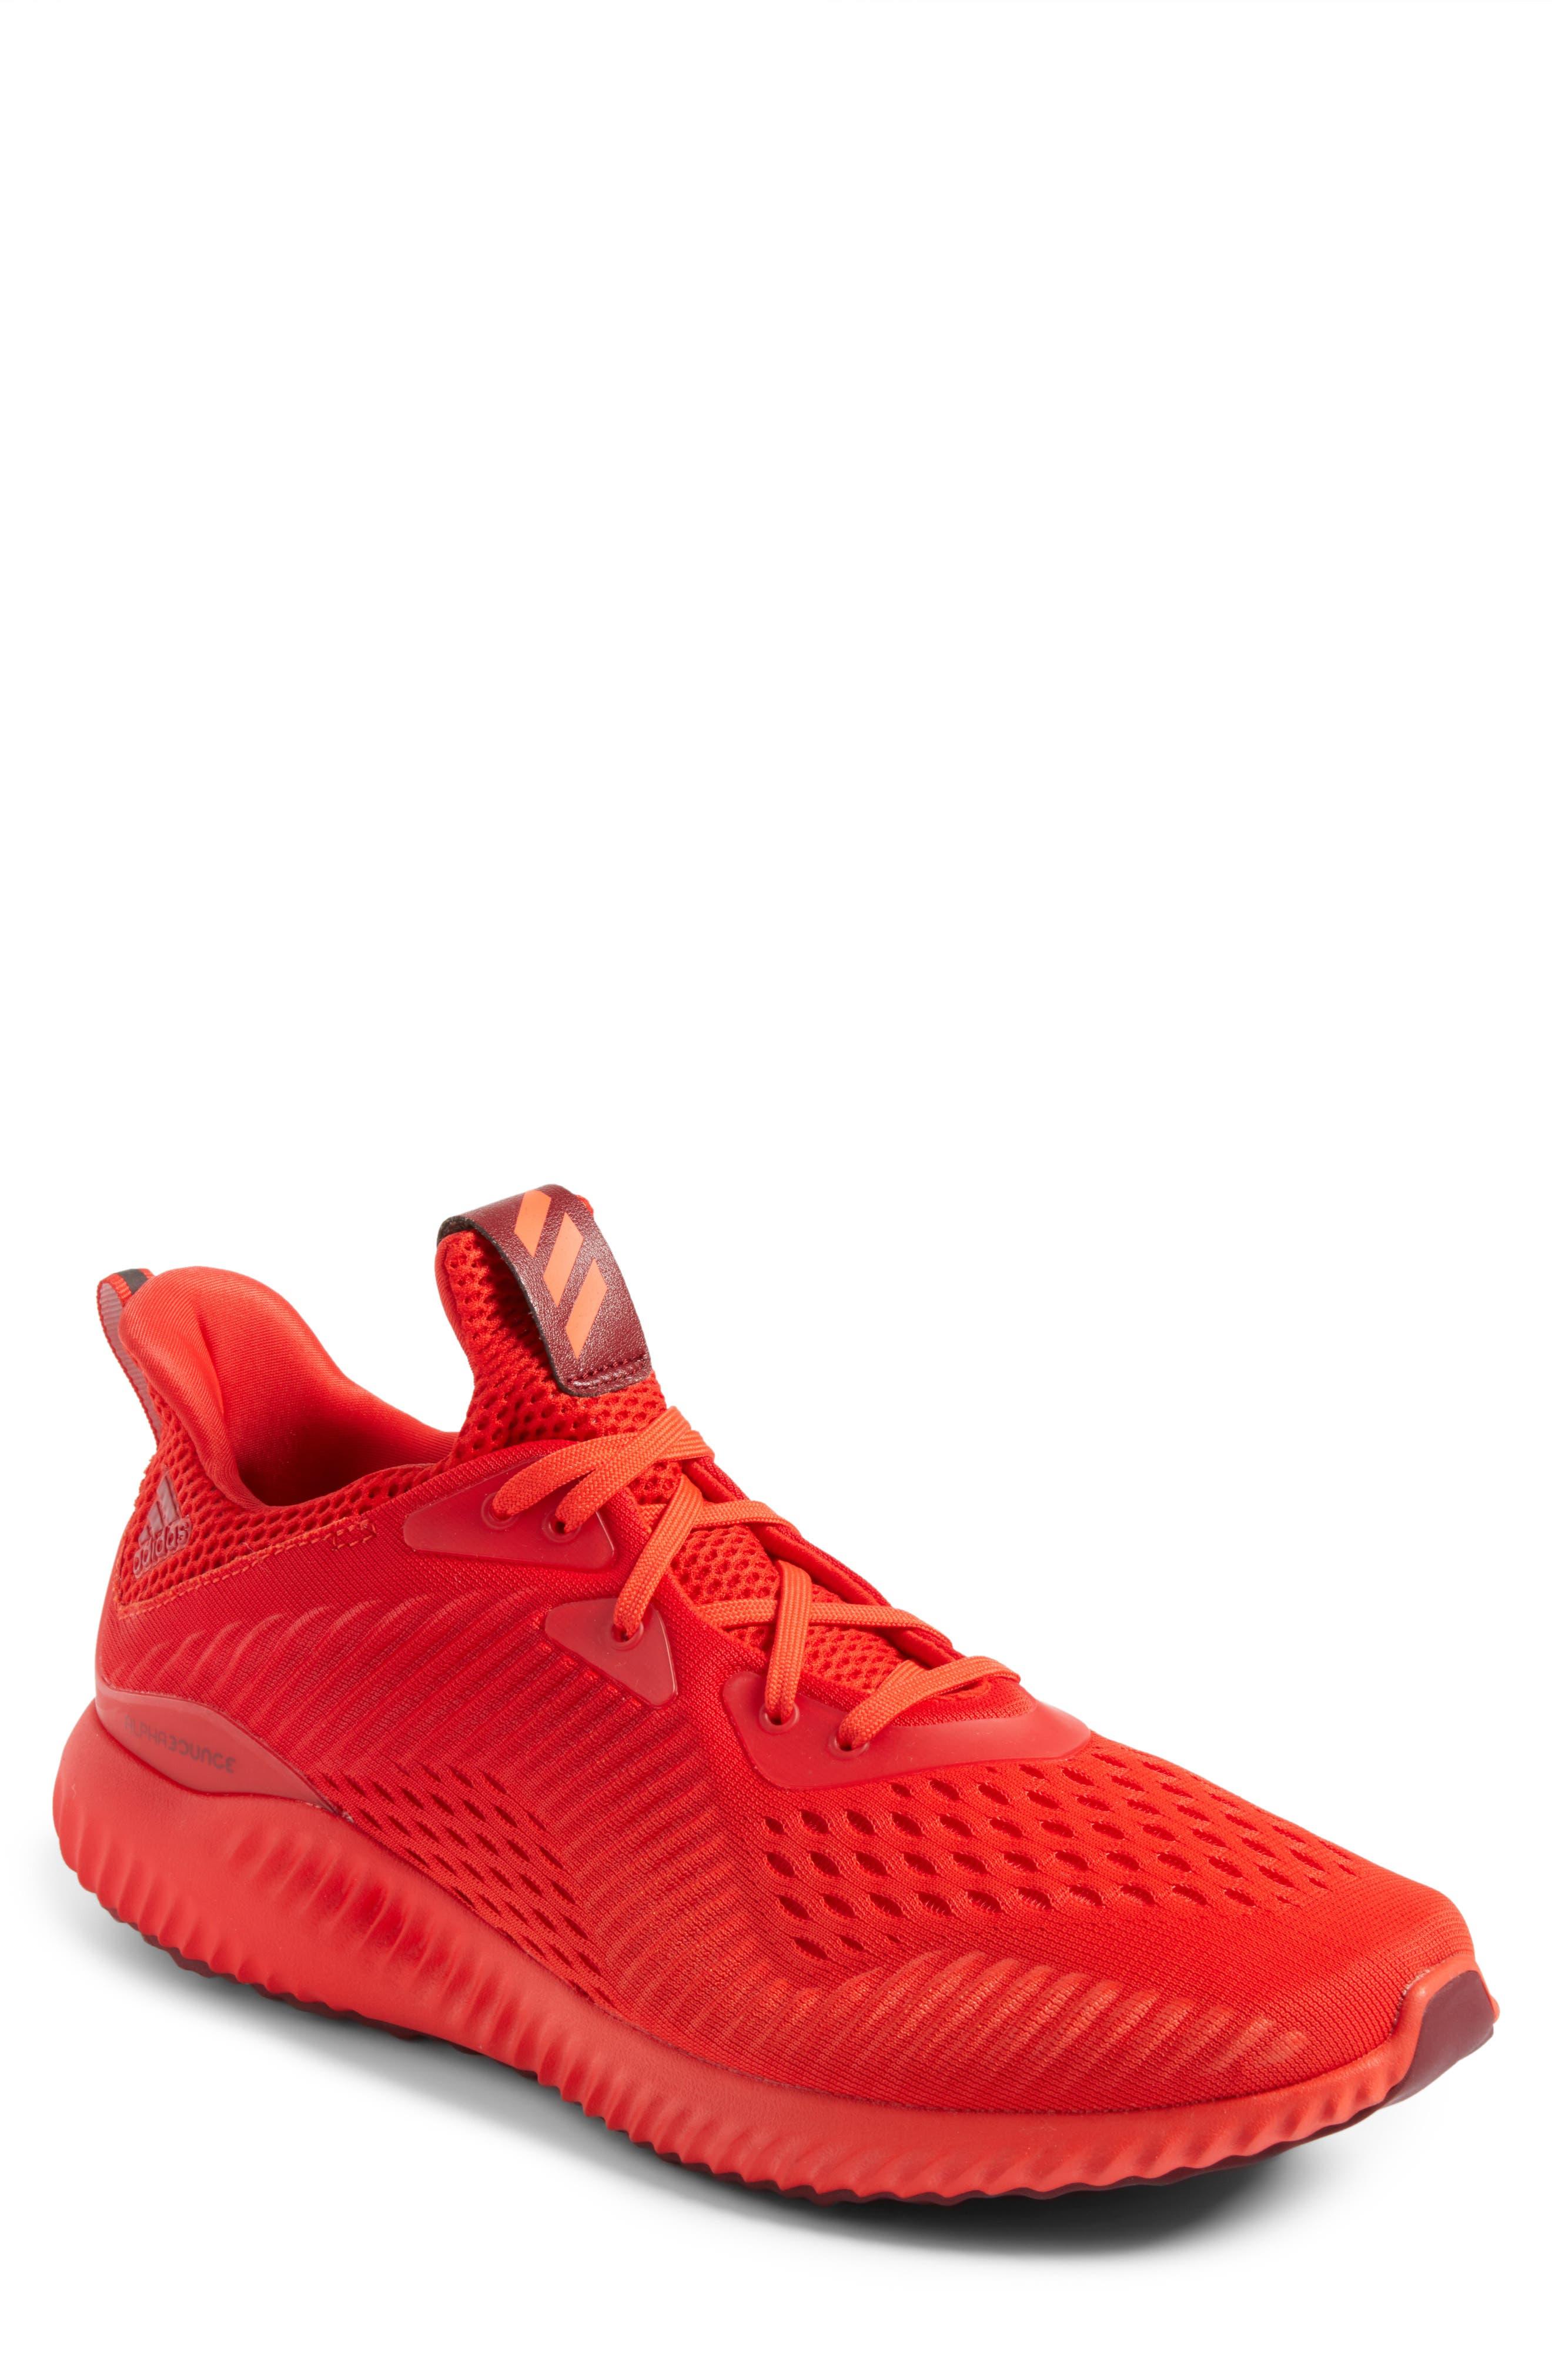 AlphaBounce Running Shoe,                         Main,                         color, Blaze Orange/Red/Burgundy